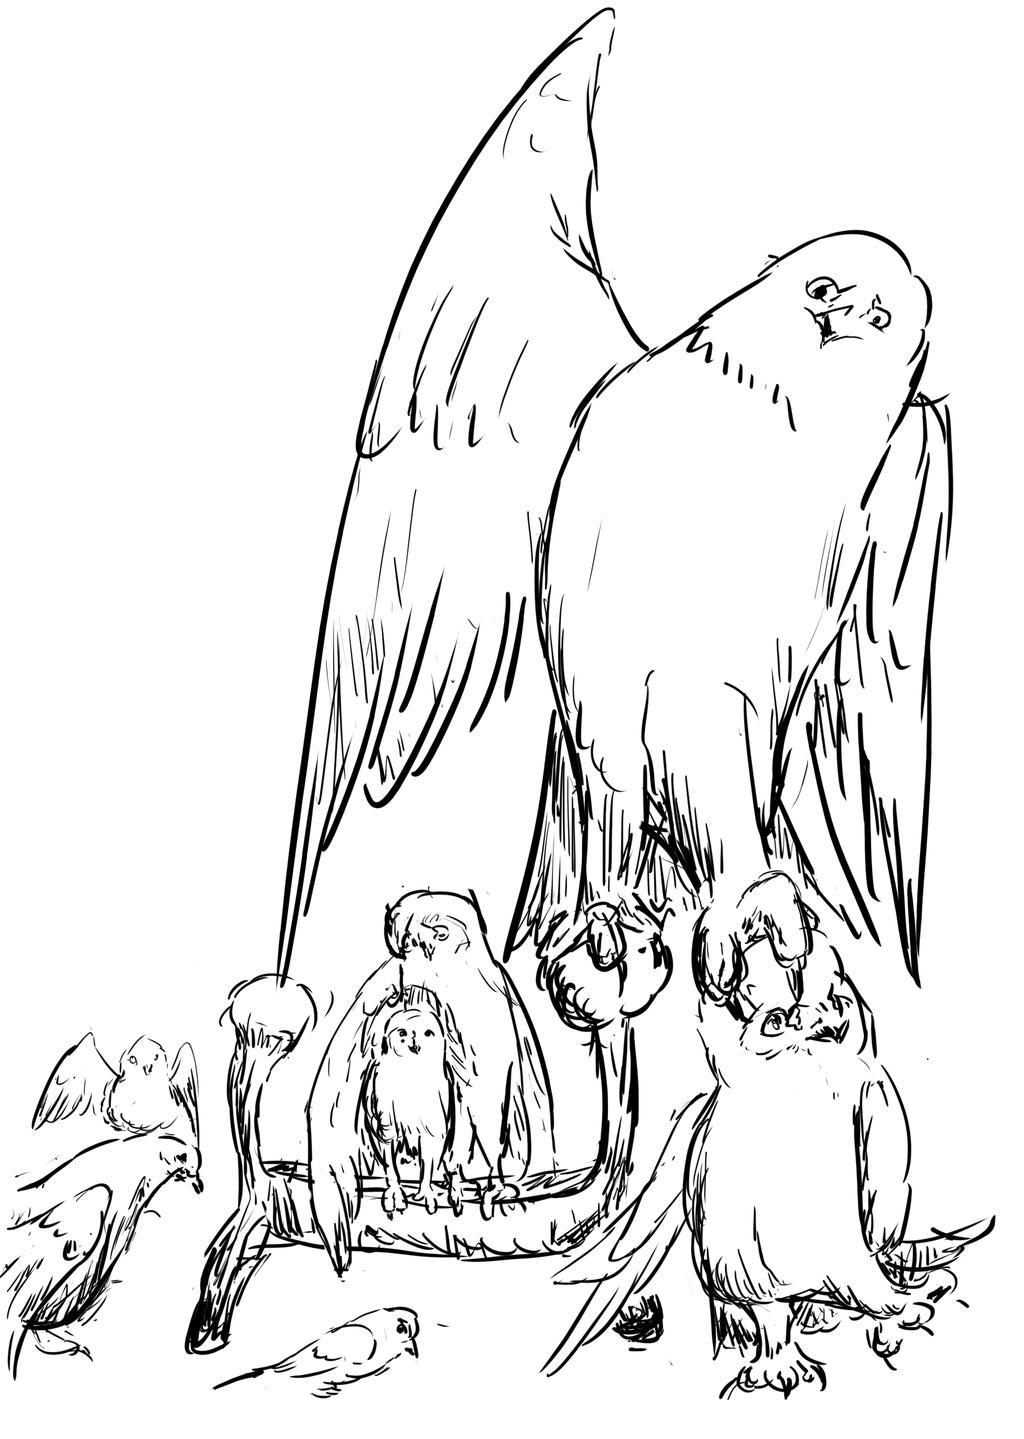 [untitled birds]